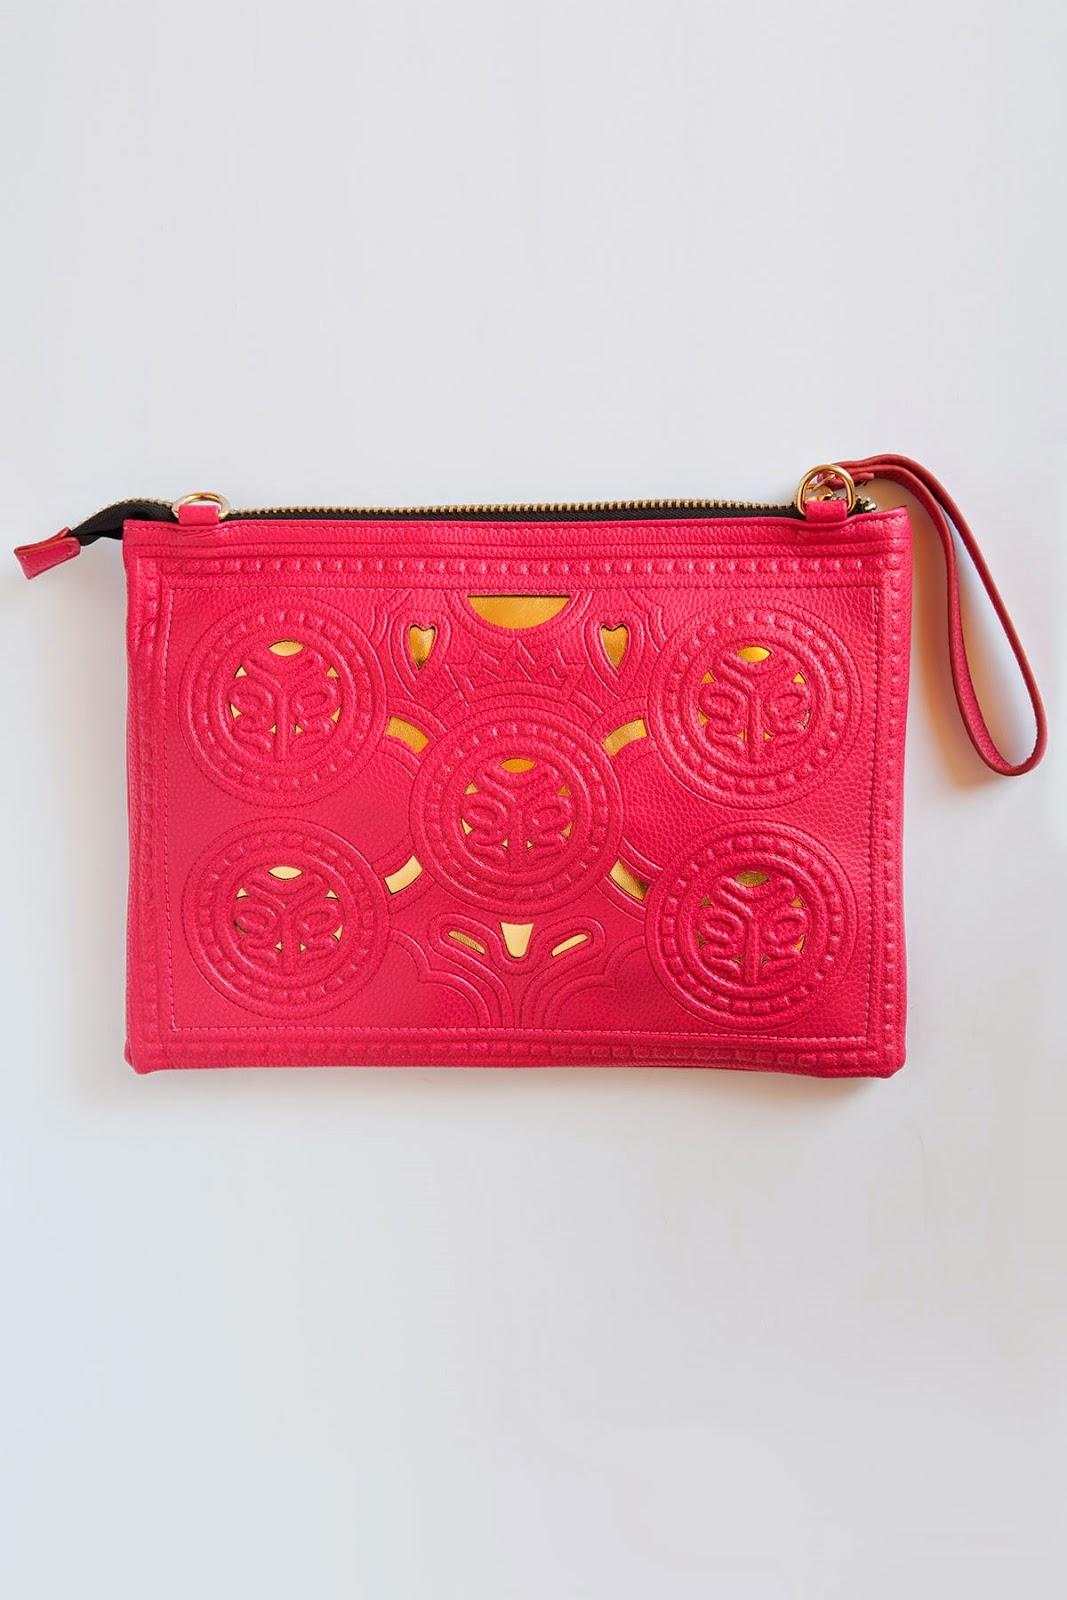 Online Clothing Stores Australia   Fashion Clothing   Women Bags ... d37dd53a8b